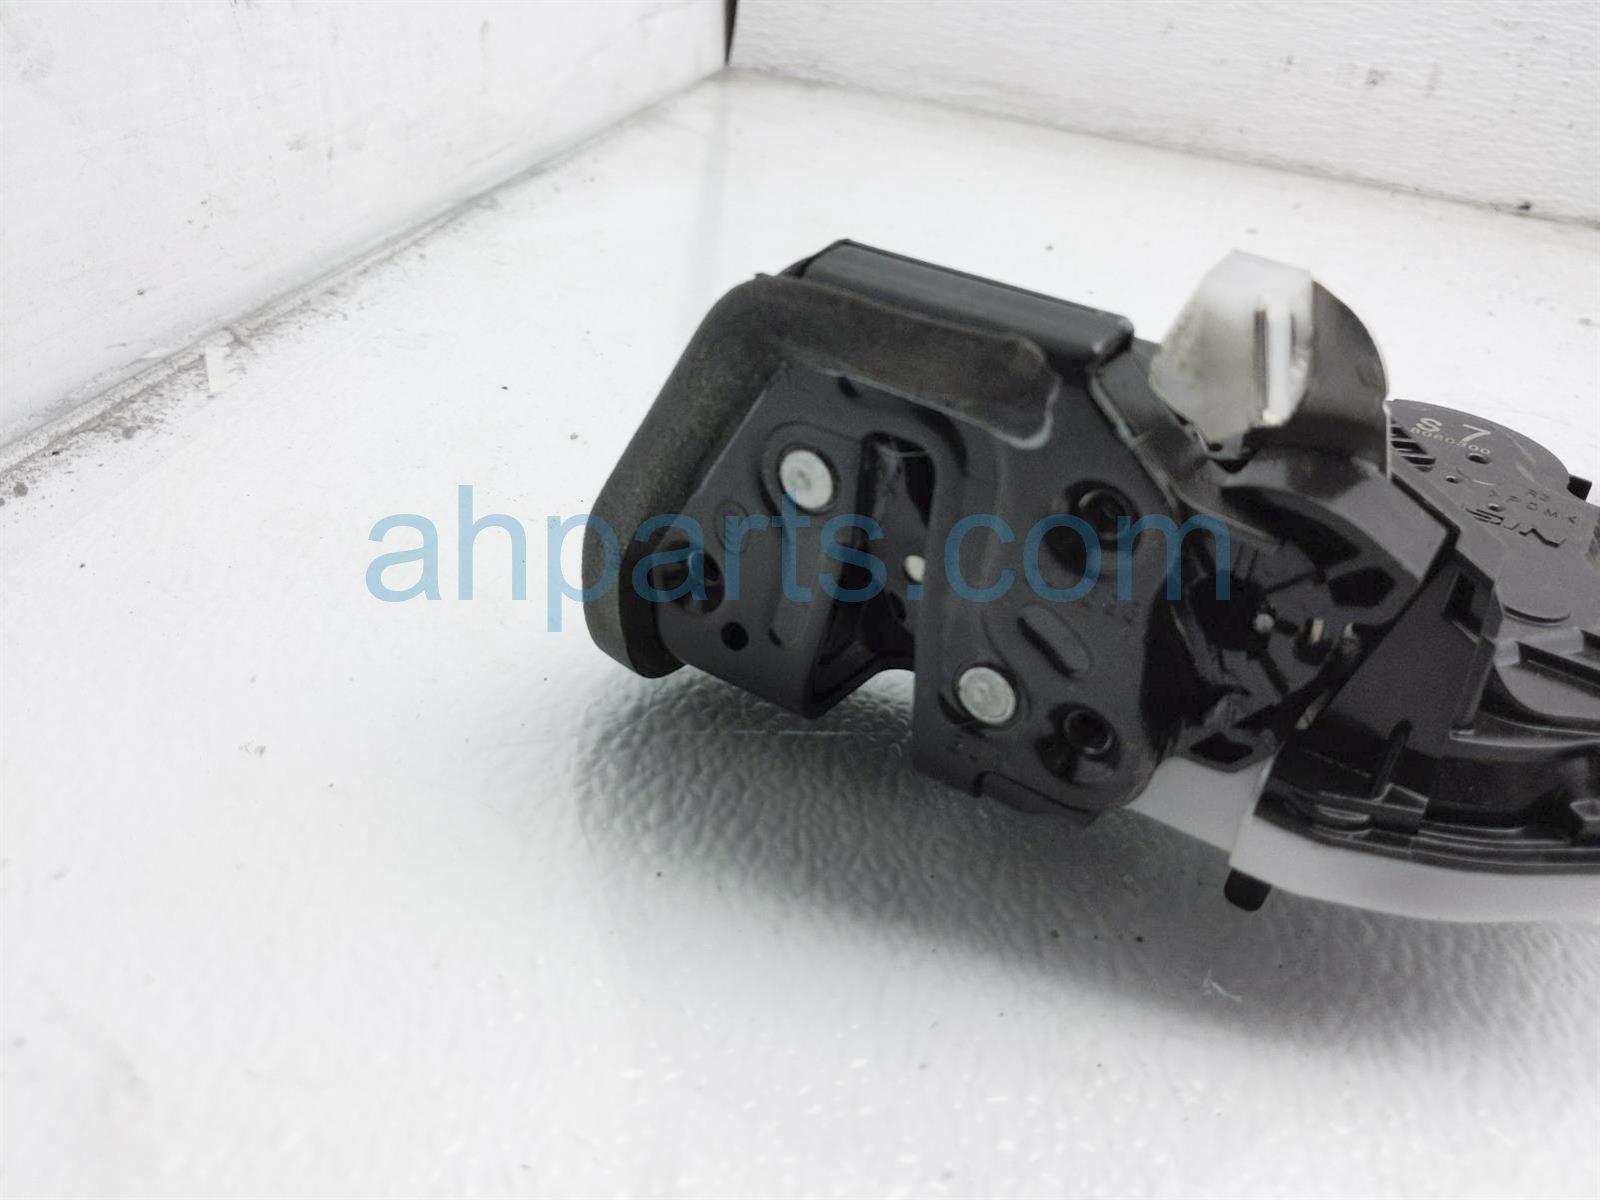 2018 Honda Clarity Rear Passenger Door Actuator Lock 72610 TRT A01 Replacement